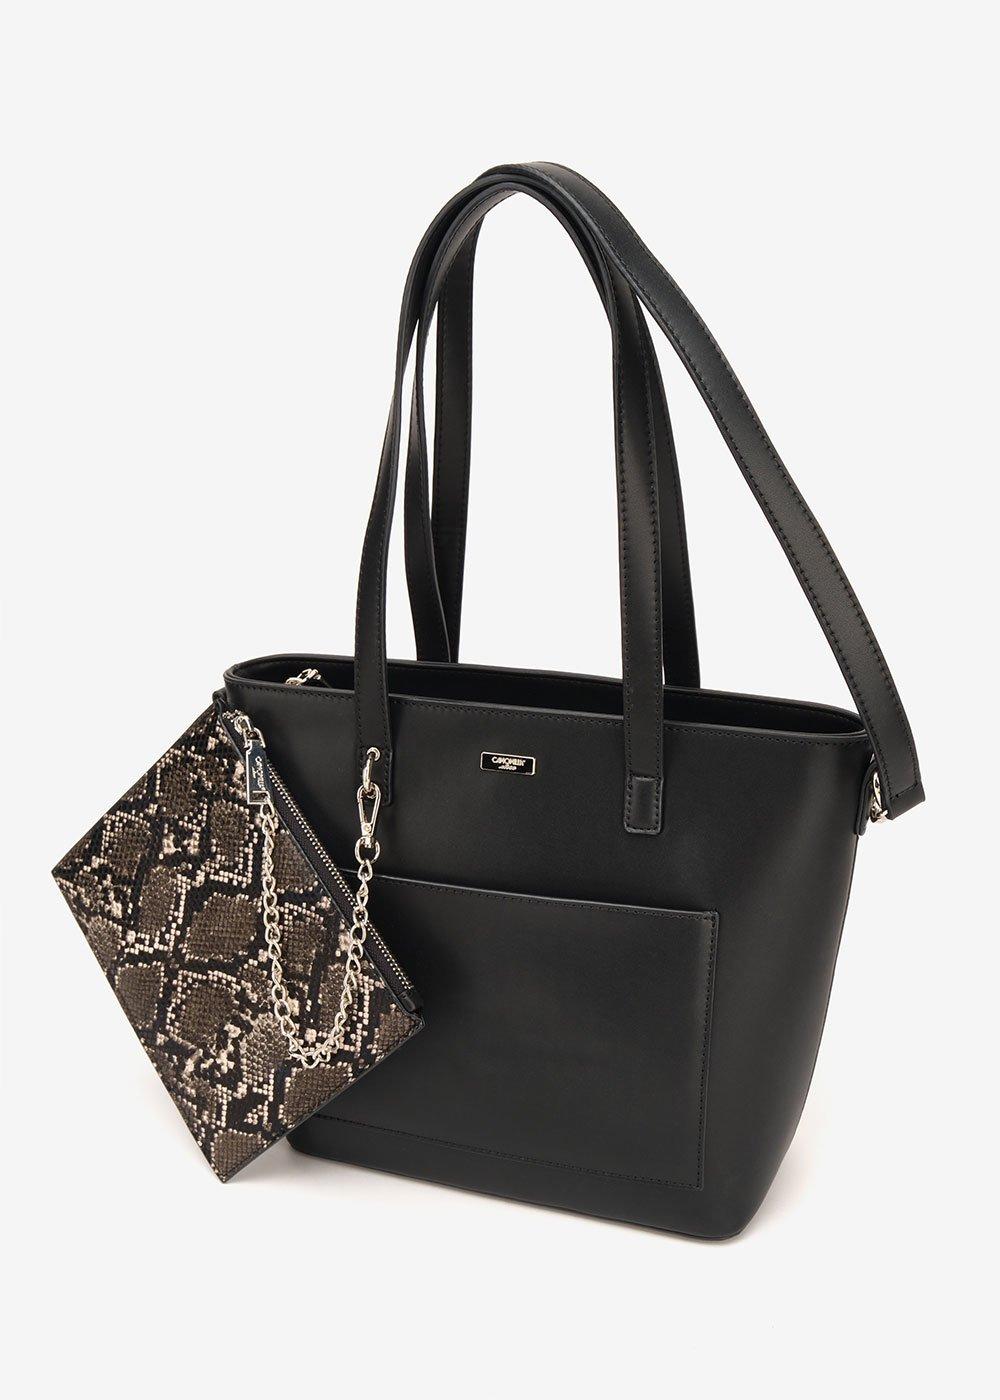 Bady shopping bag with python purse - Black - Woman